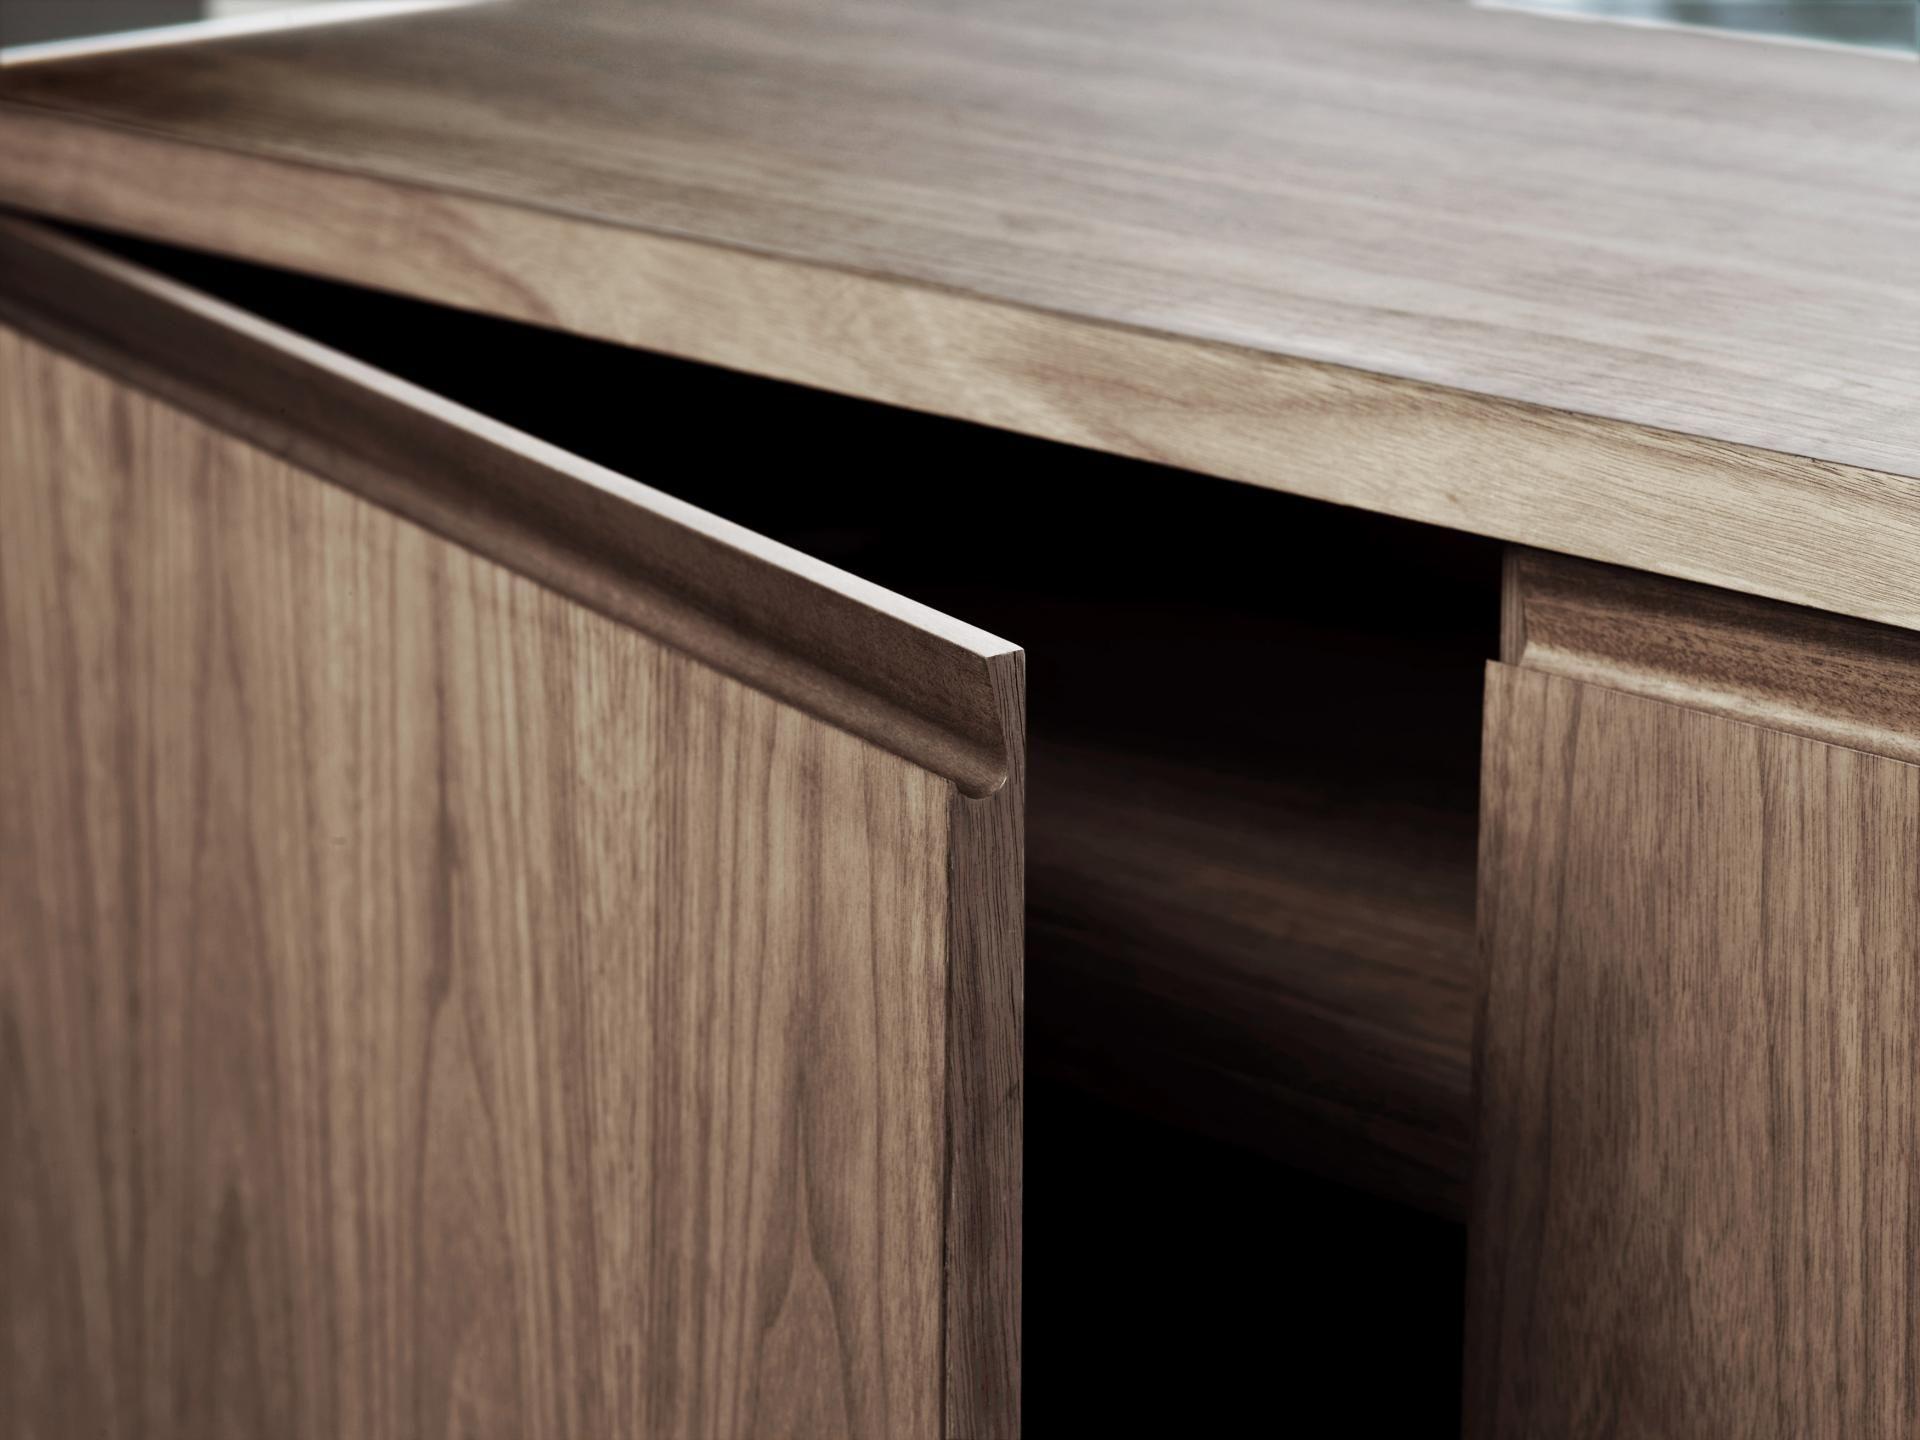 Puxador Cava In 2019 Drawer Design Furniture Handles